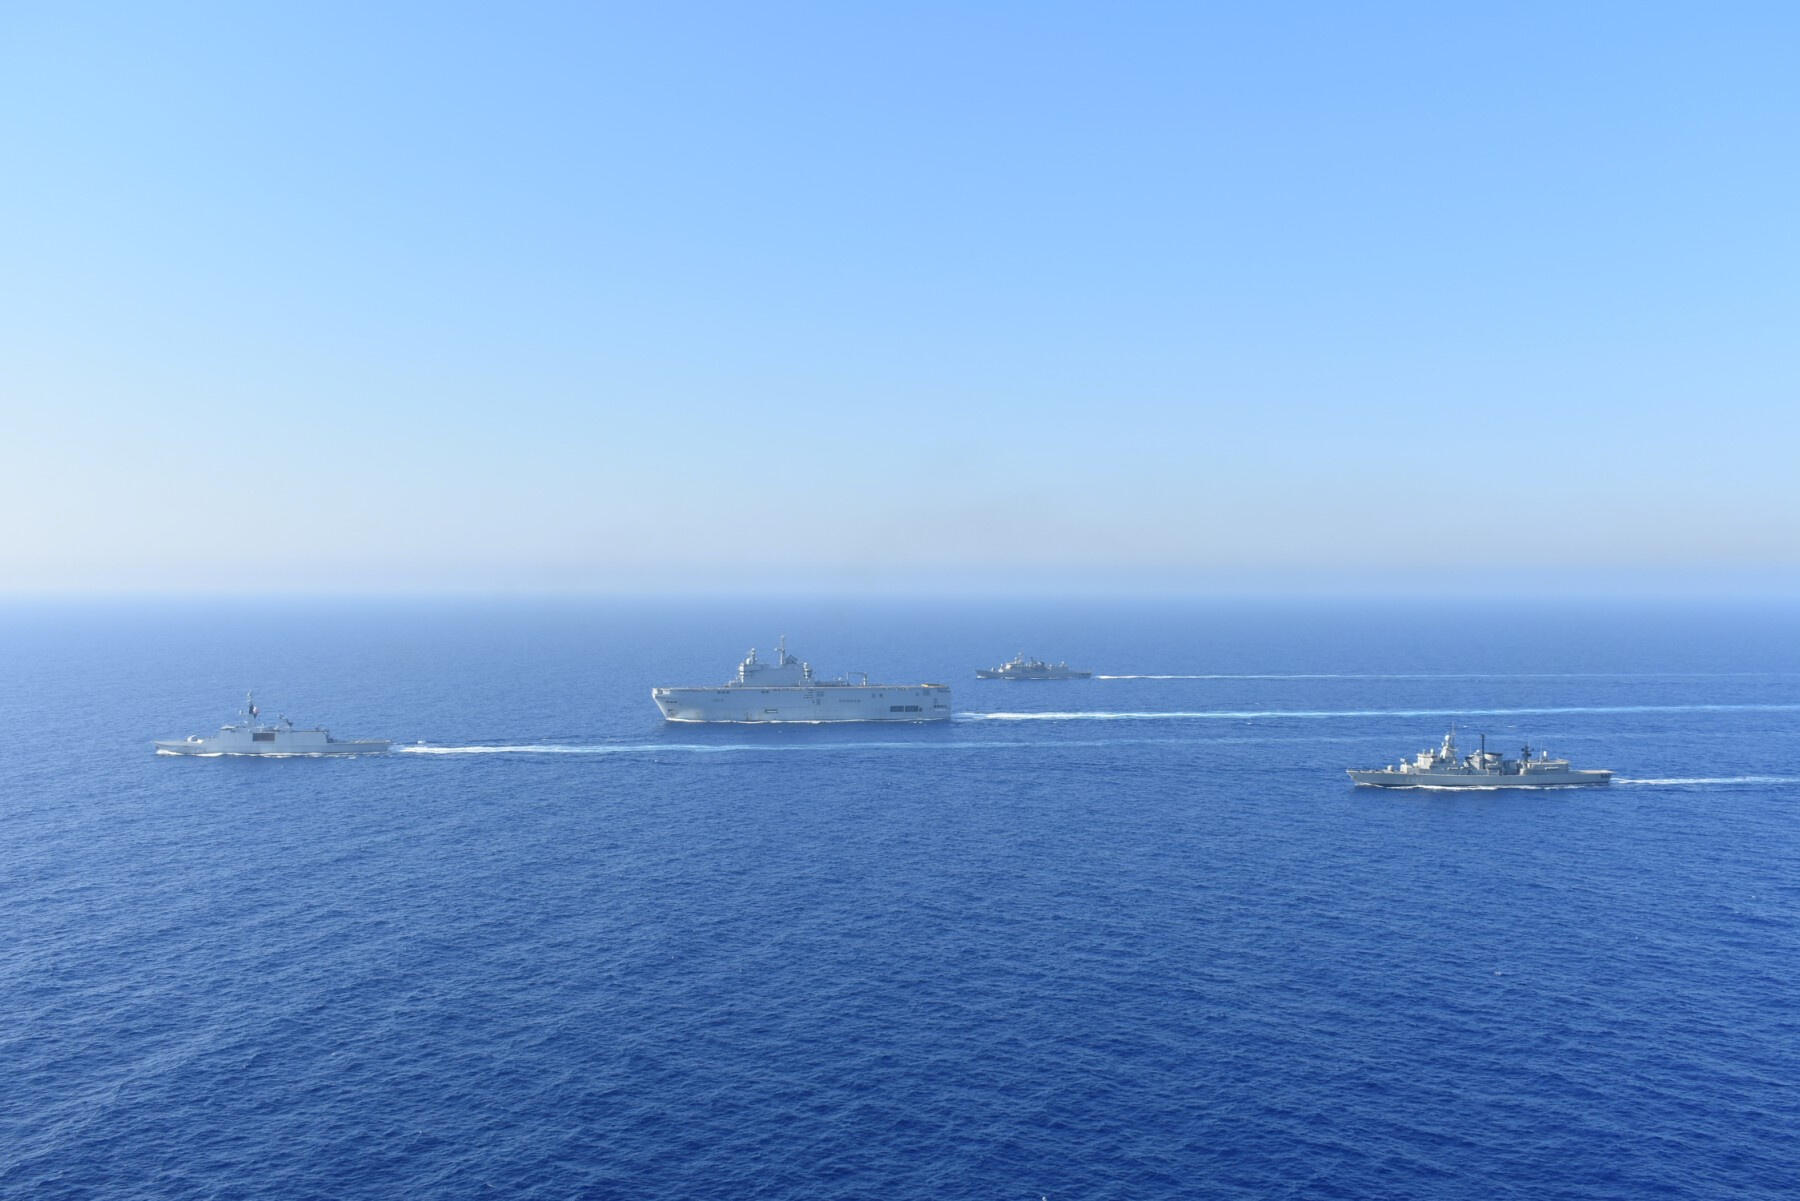 2020-08-13 greece france military exercises mediterranean